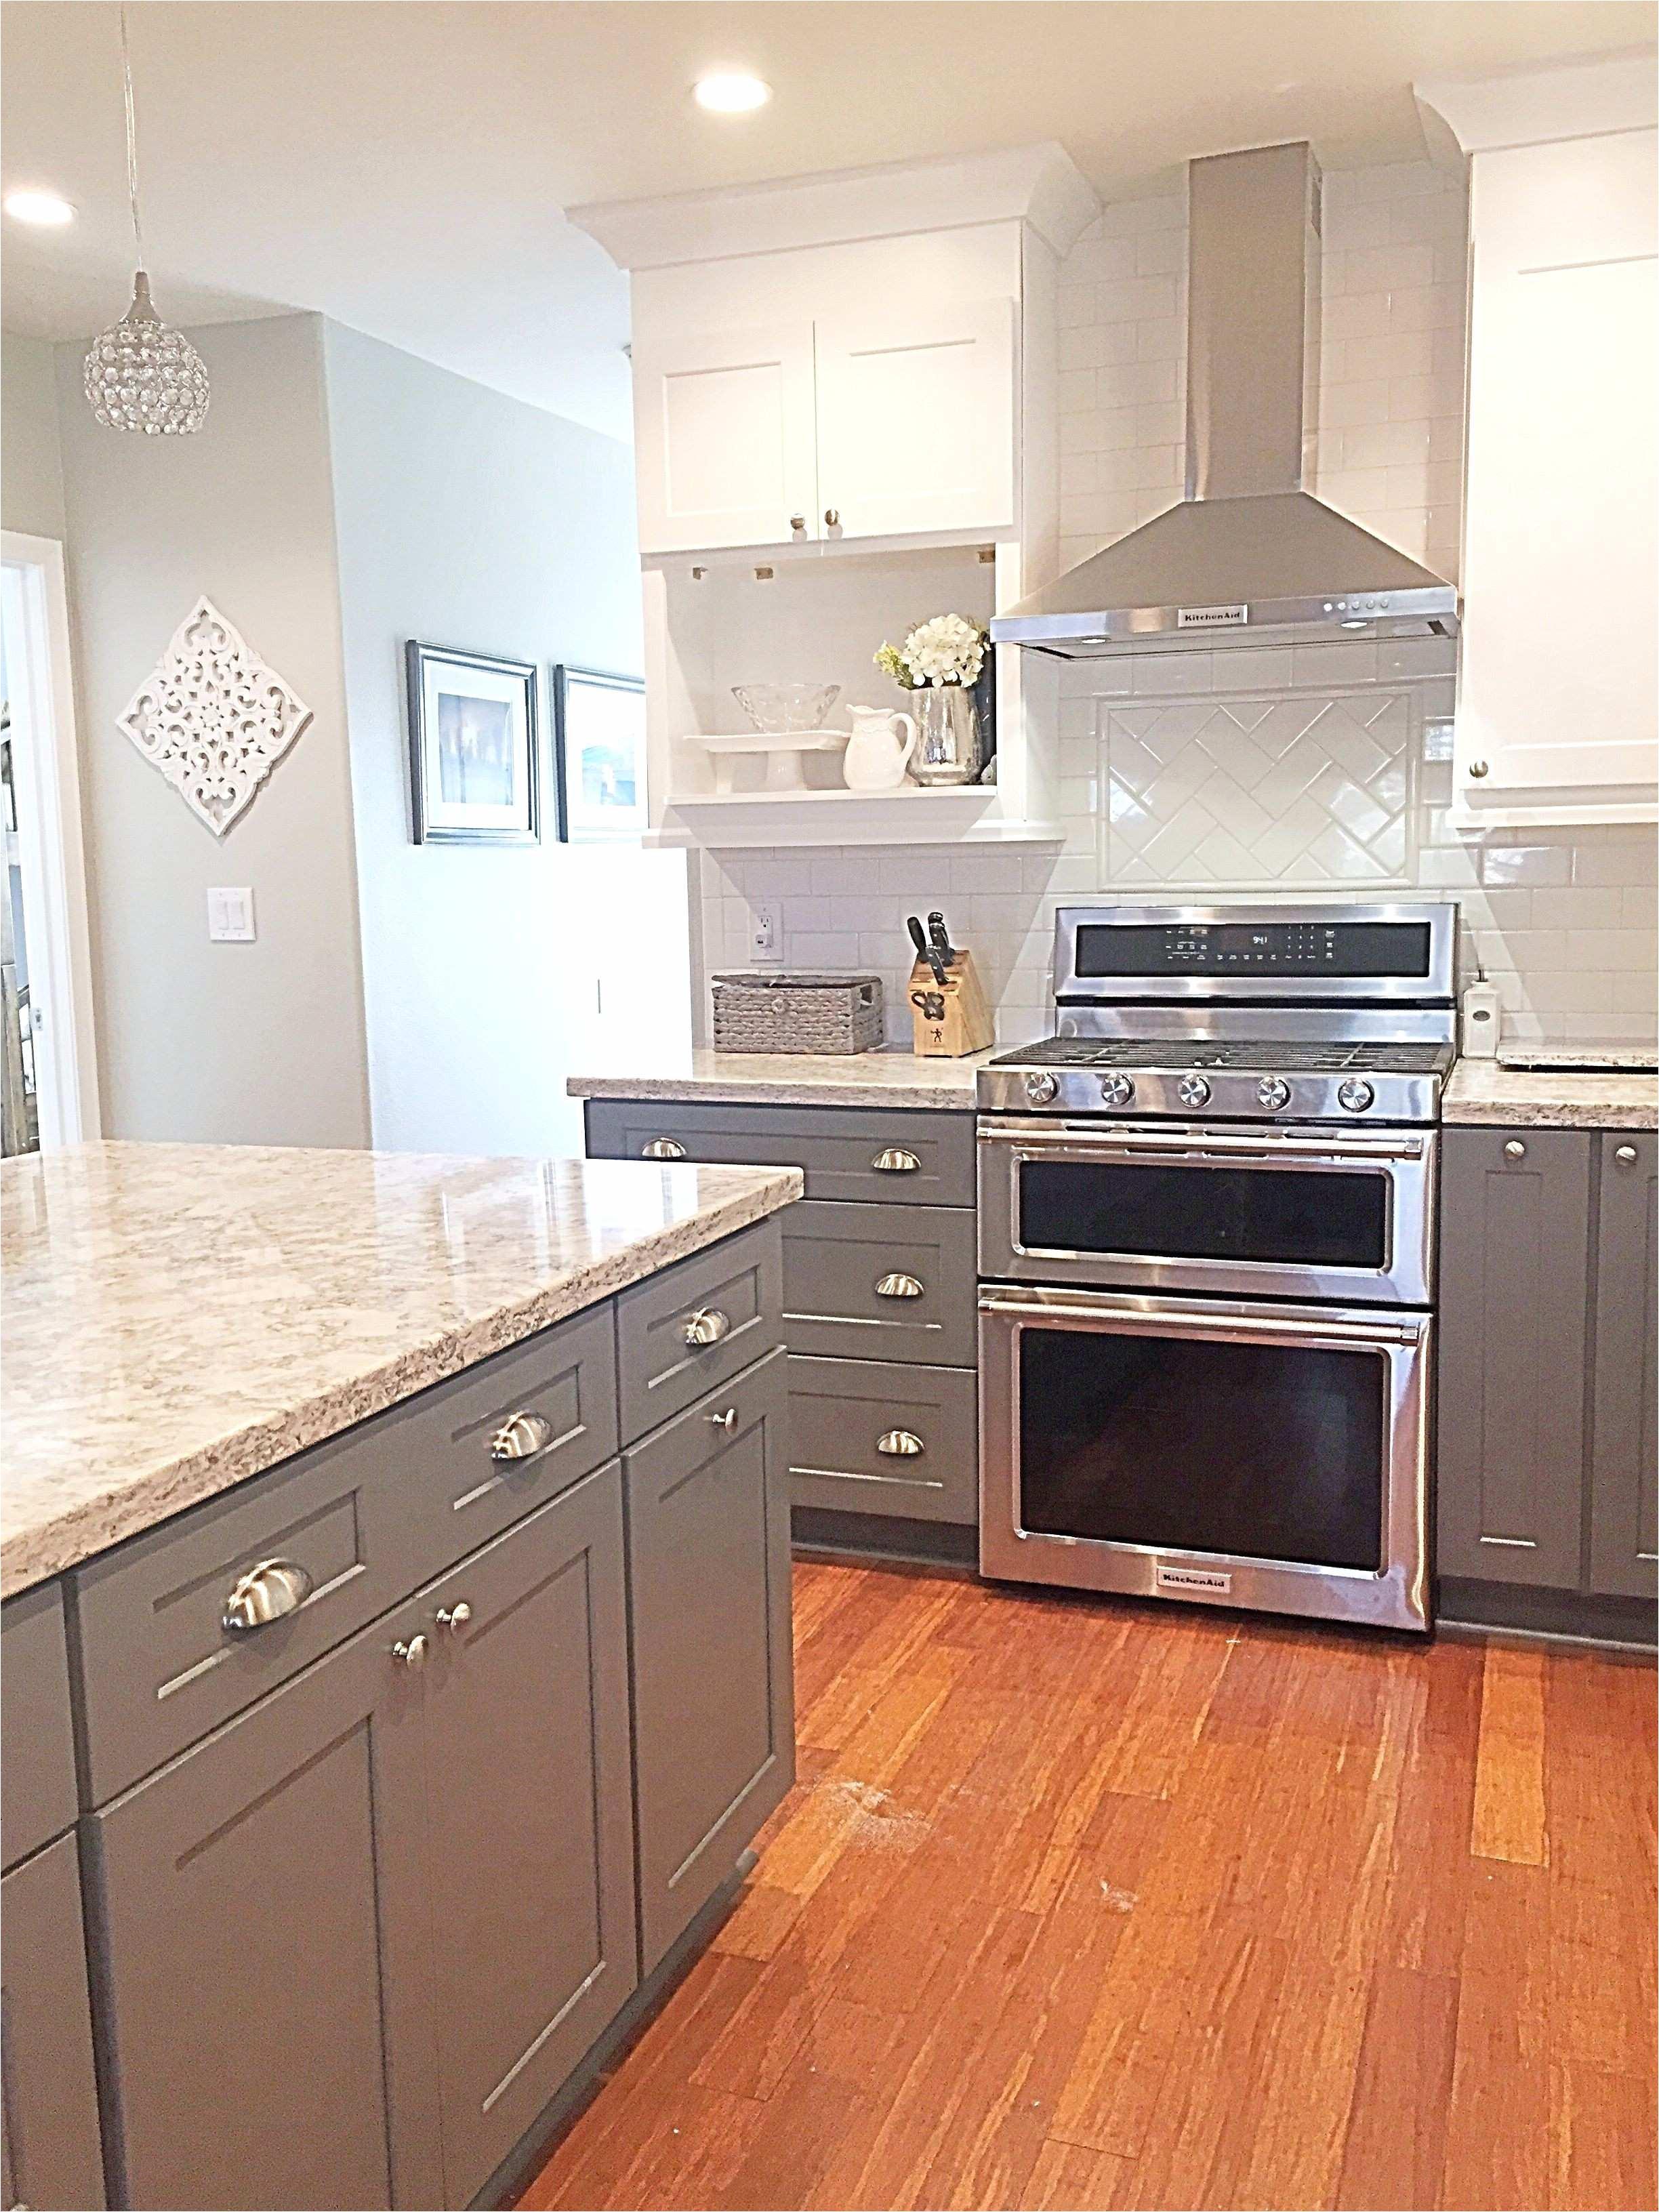 best kitchen appliances for the money awesome kitchen cabinet color beautiful kitchen cabinet 0d elegant kitchen